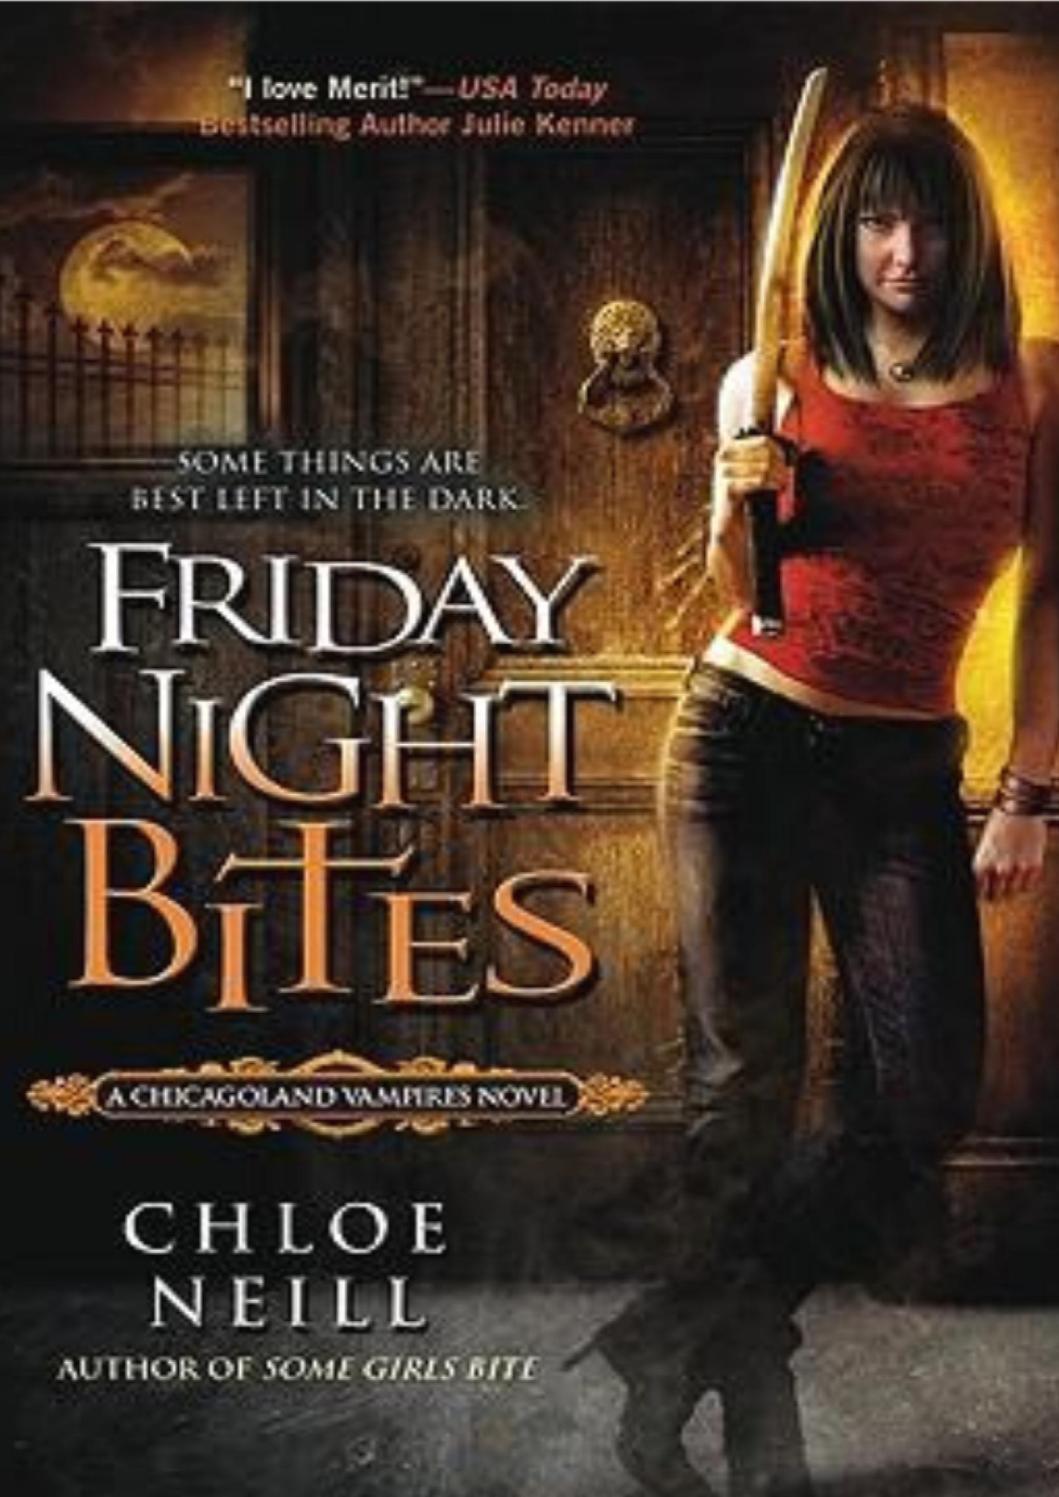 6a2da76915429 Chloe neill vampiros de chicagoland 02 friday night bites by rafaelasilva4  - issuu